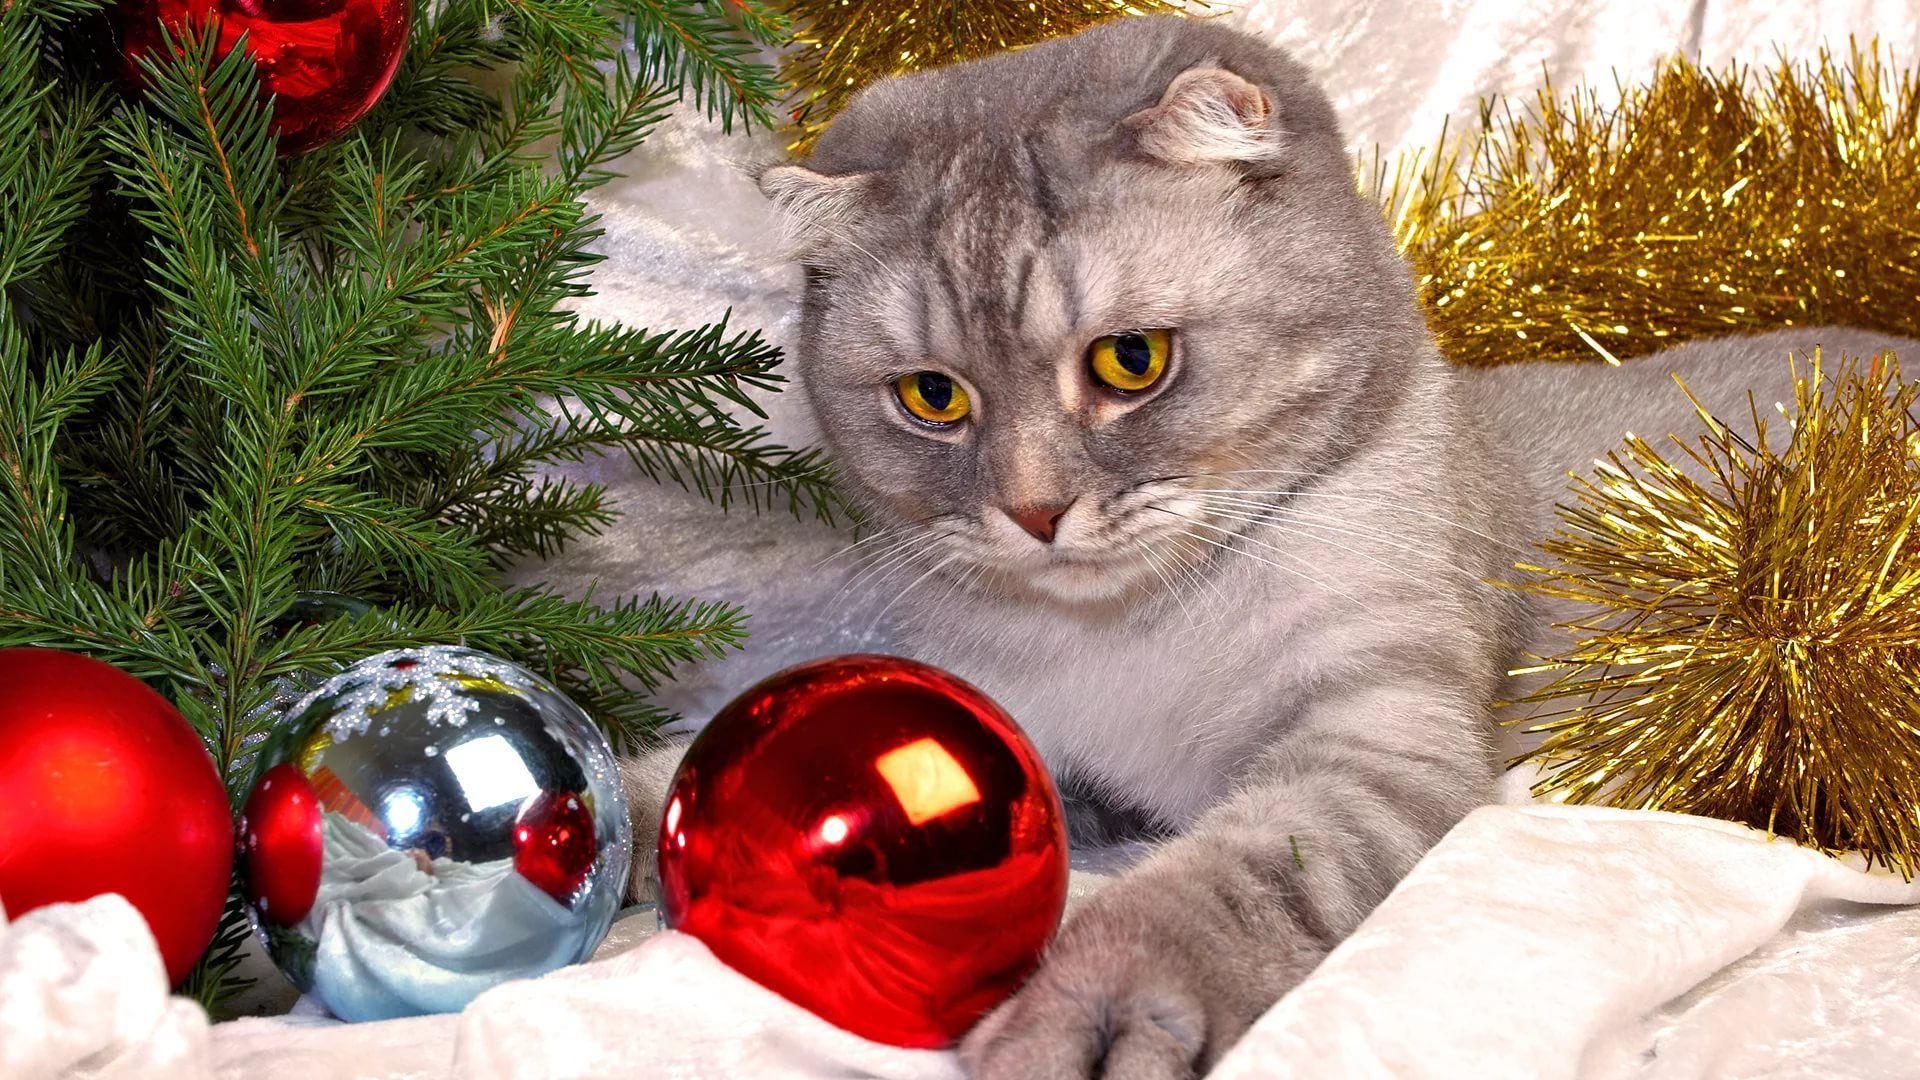 Christmas Cat new wallpaper